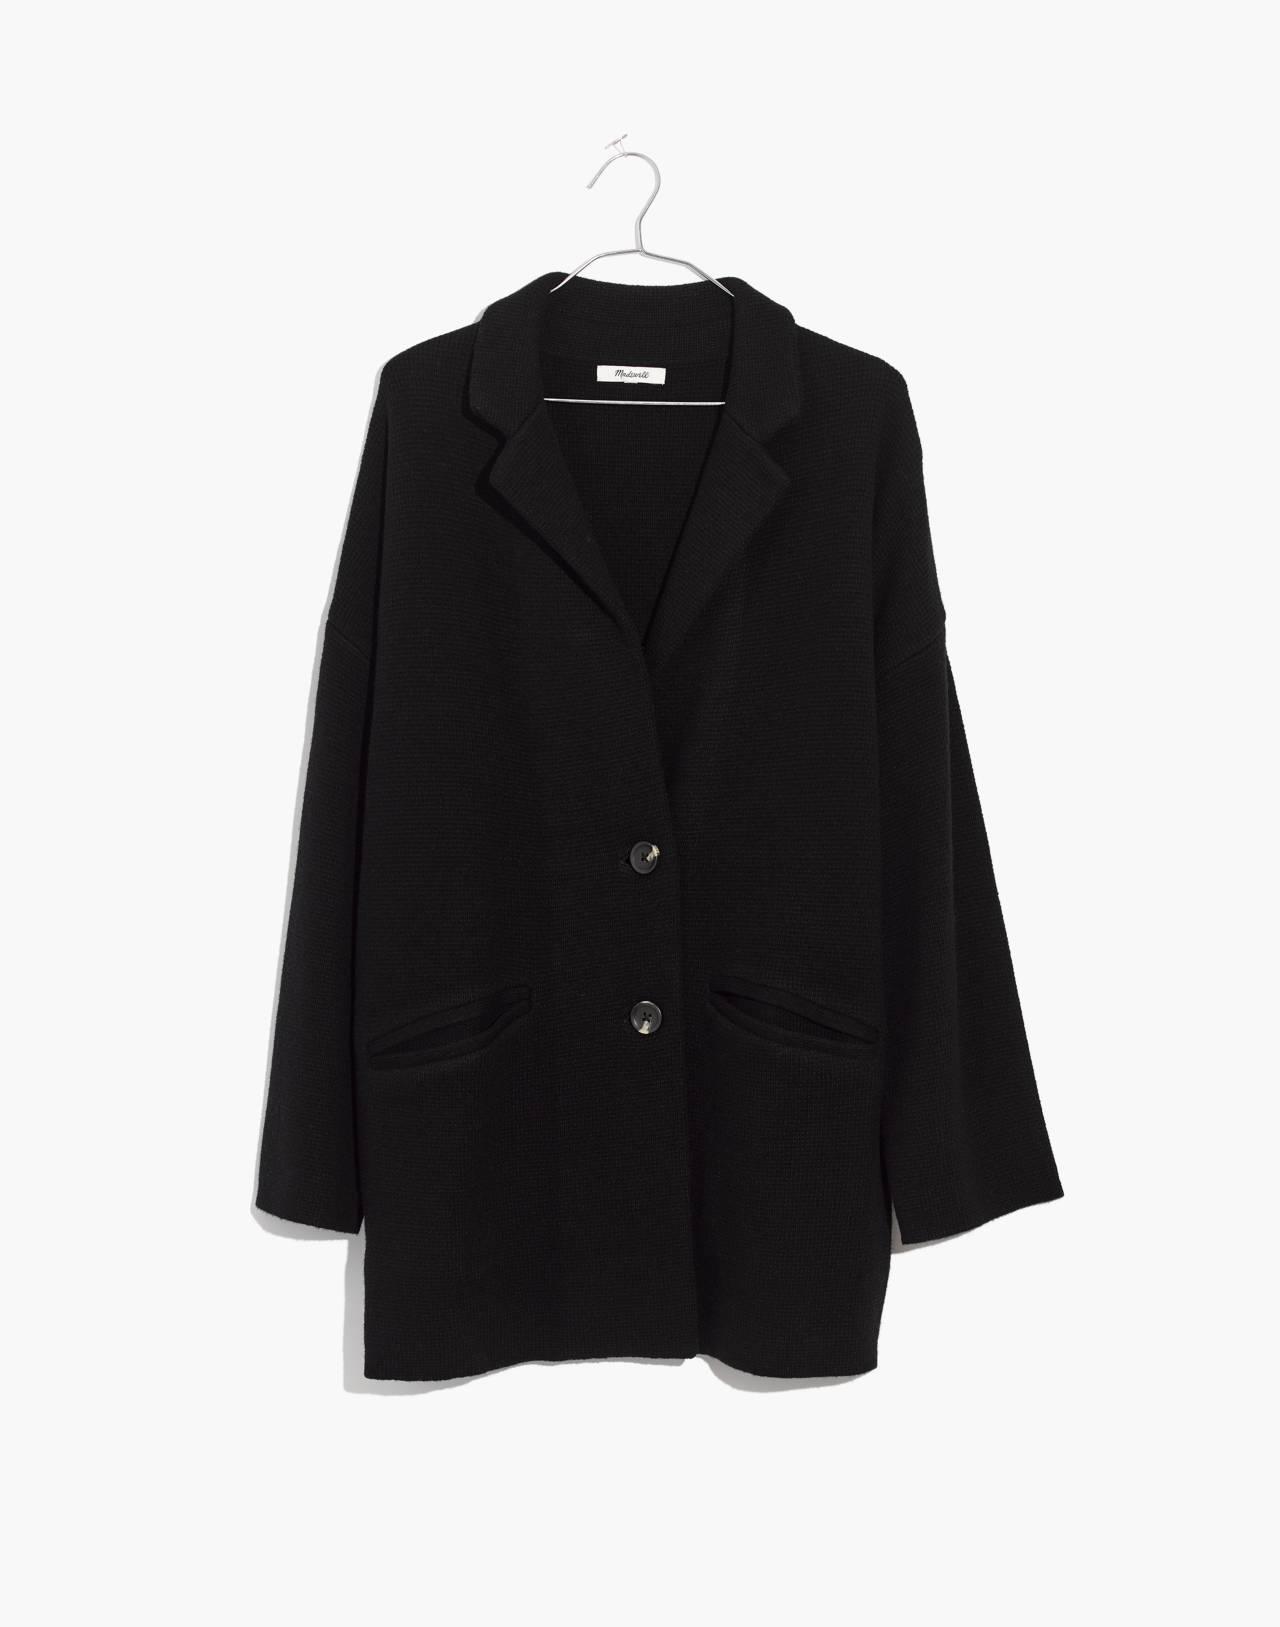 Blazer Sweater-Jacket in true black image 1